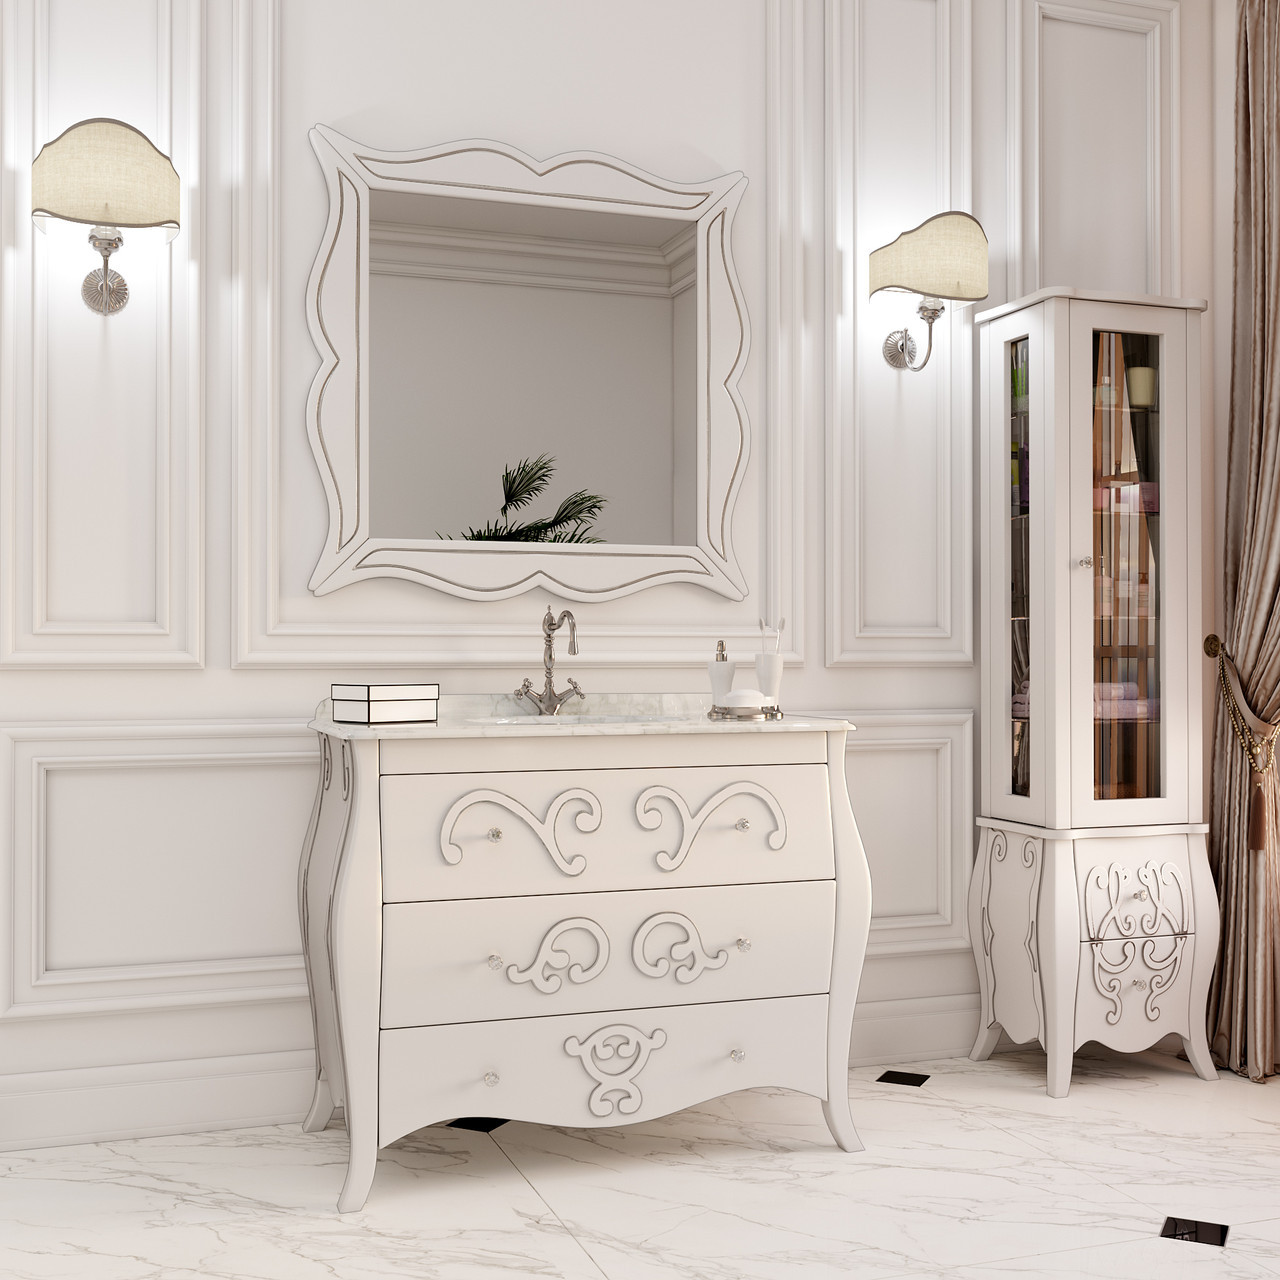 Тумба для ванной комнаты Marsan Arlette 1050 контур серебро